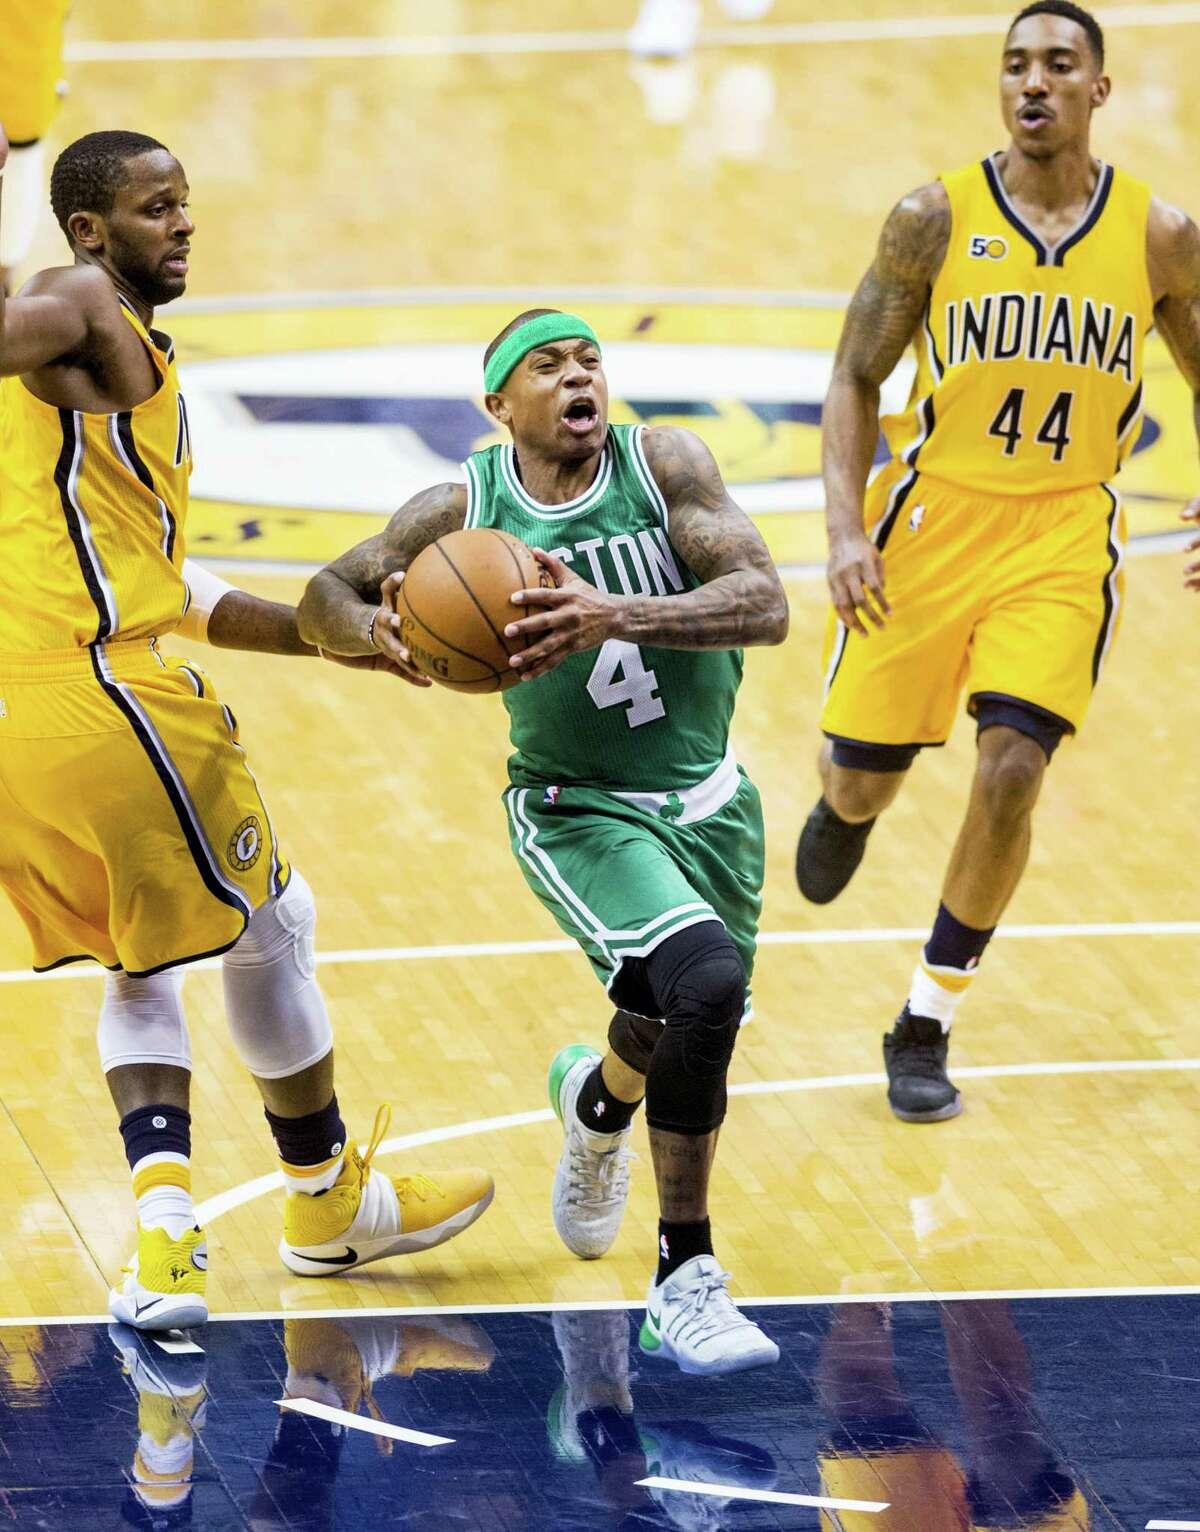 Boston Celtics guard Isaiah Thomas (4) drives the ball to the basket in the second half of an NBA basketball game, Saturday, Nov. 12, 2016, in Indianapolis. The Celtics won 105-99. (AP Photo/Doug McSchooler)